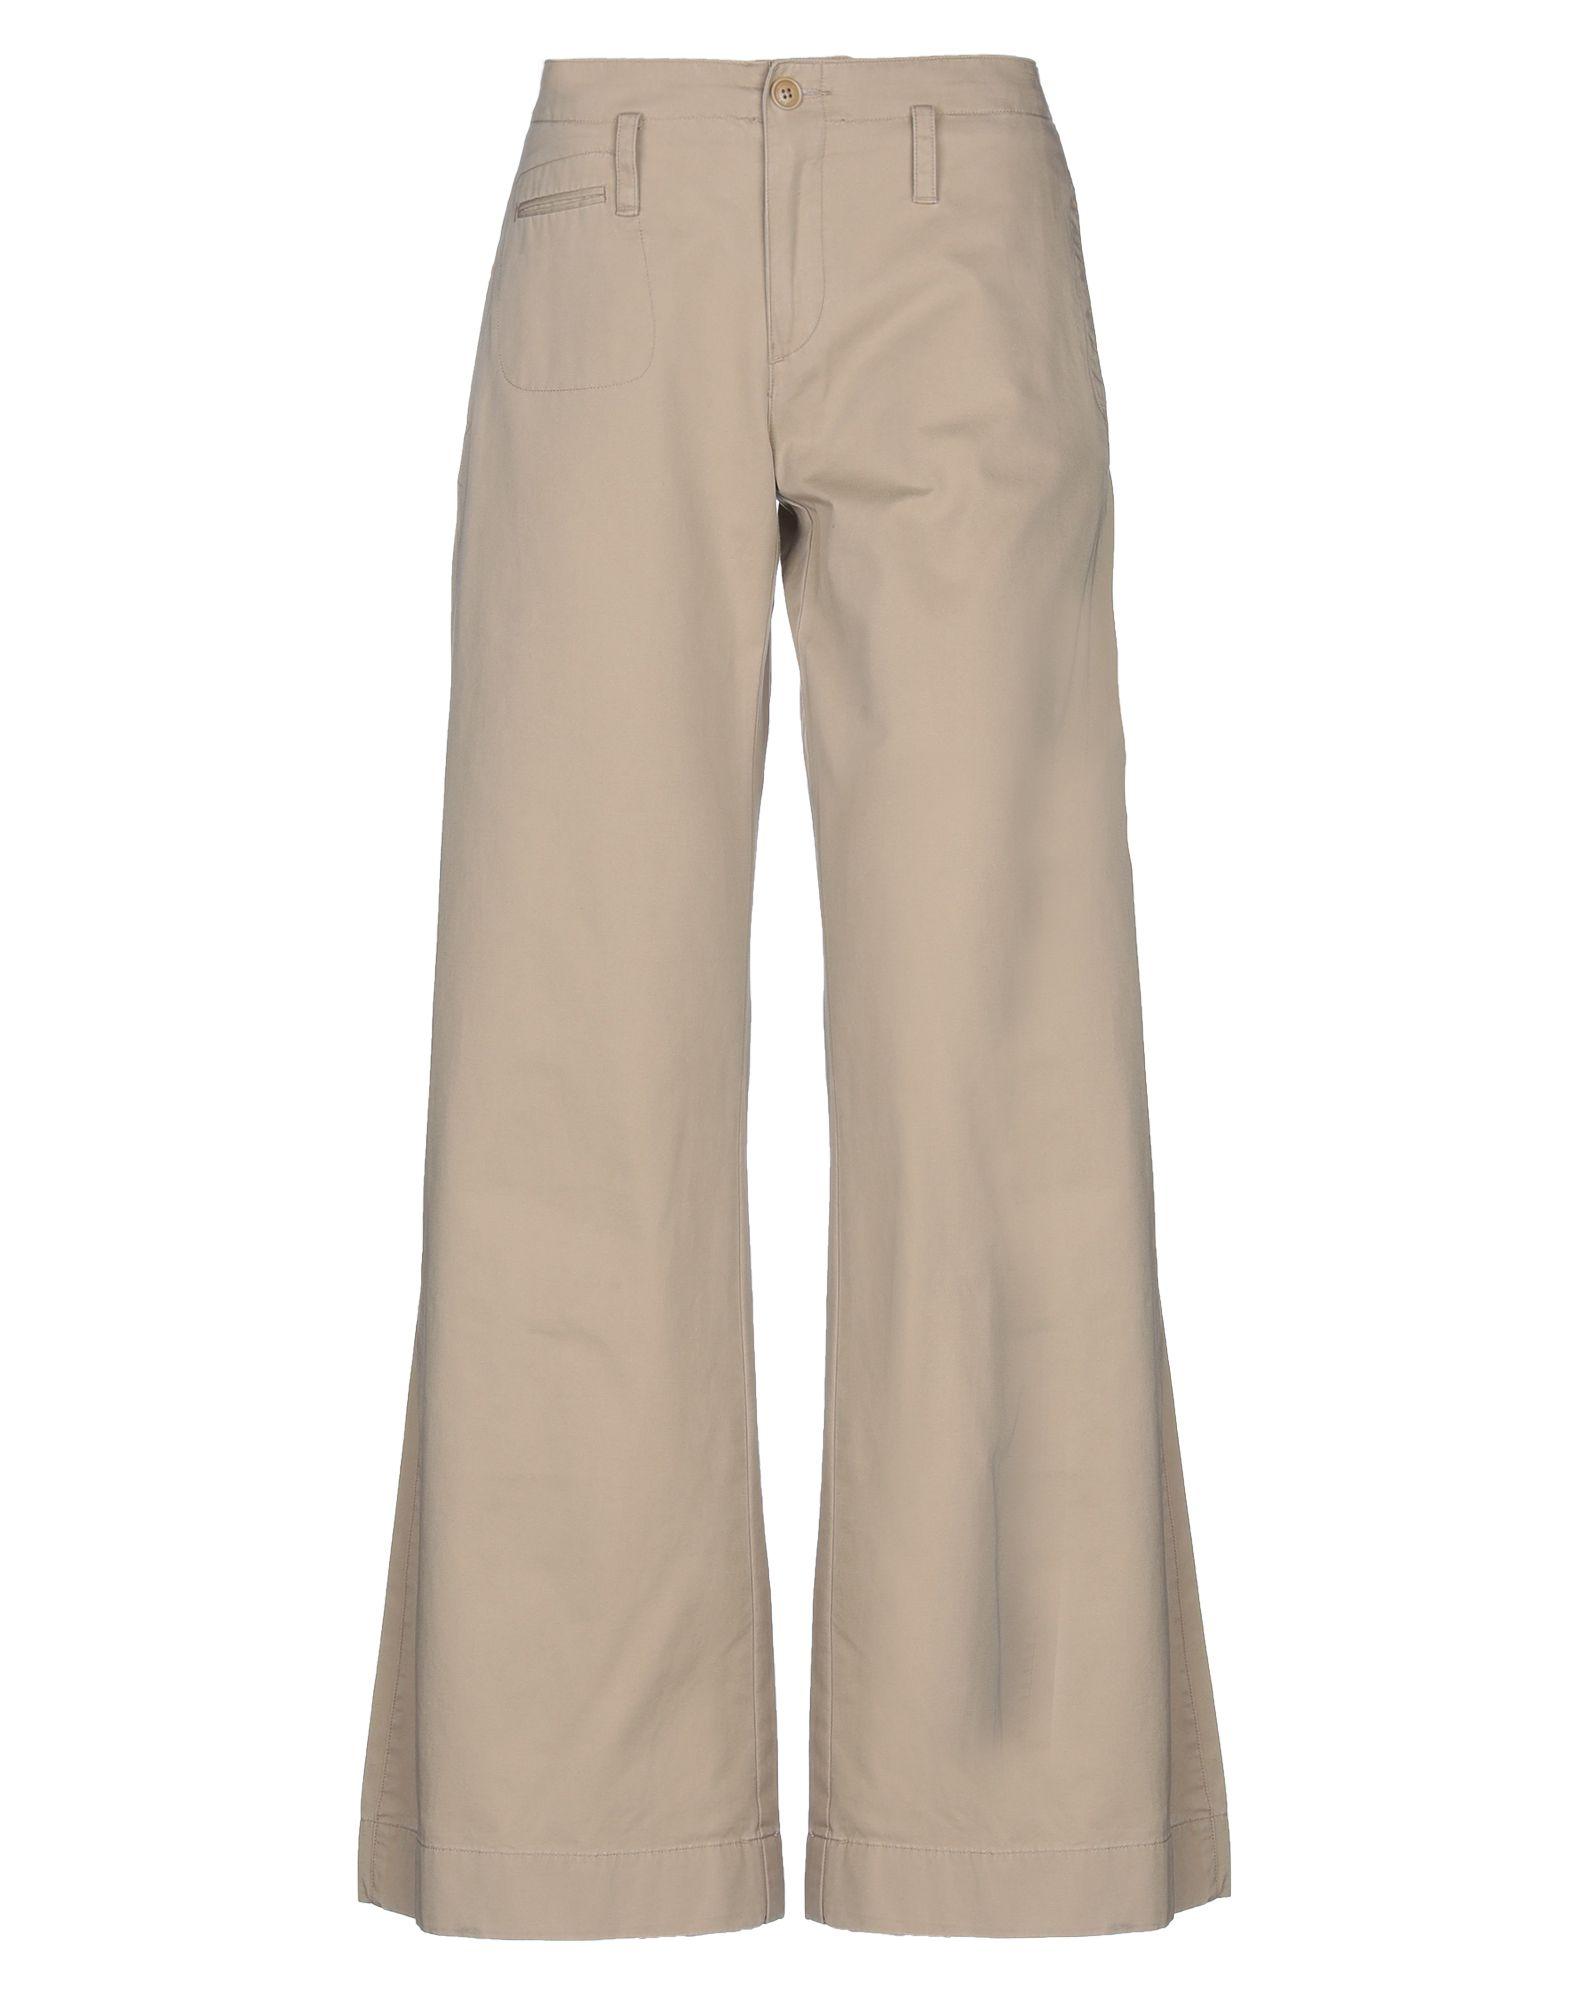 POLO JEANS COMPANY Повседневные брюки